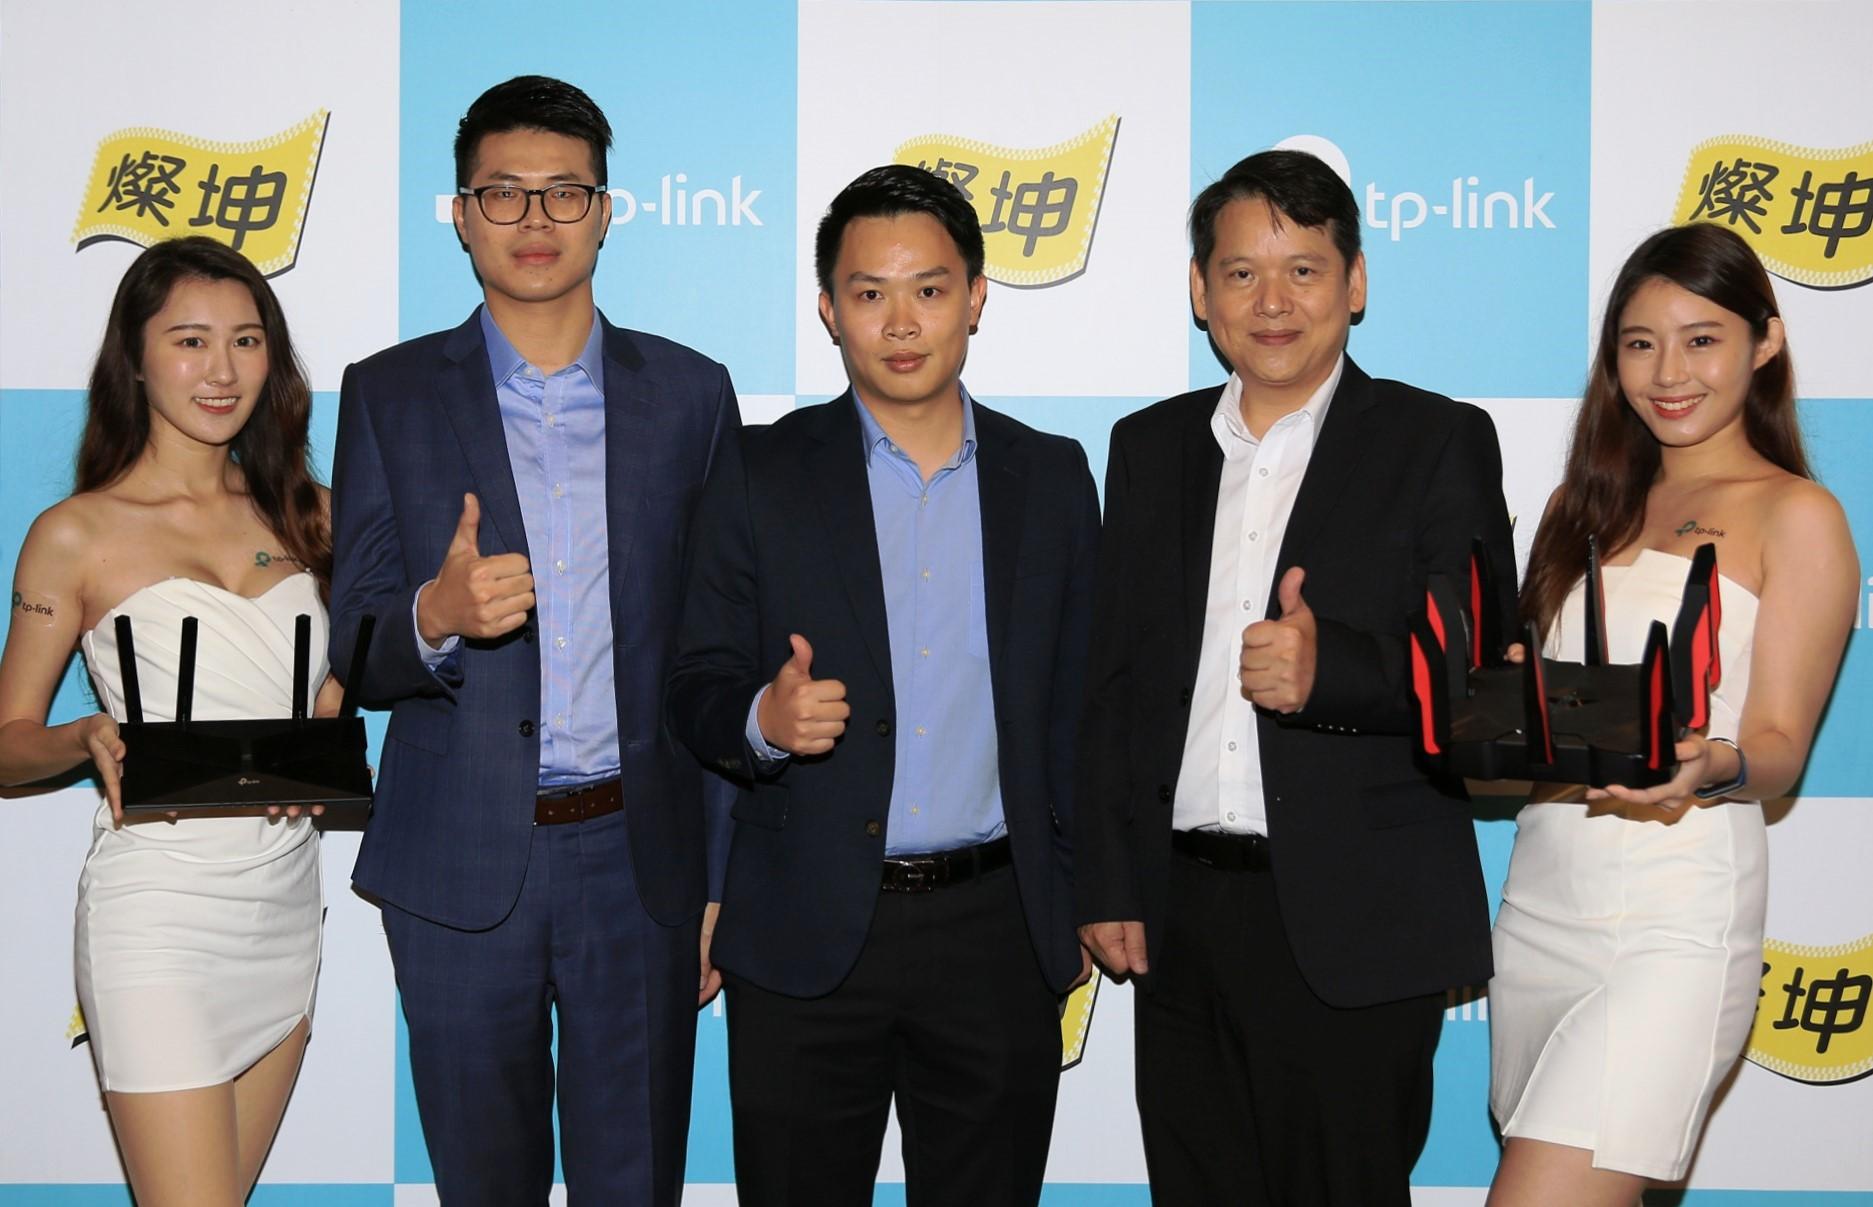 TP-Link®今日攜手線上及實體通路燦坤3C,分別以技術實力與優質售後服務,宣布帶領台灣消費市場網通產品進入Wi-Fi 6新紀元